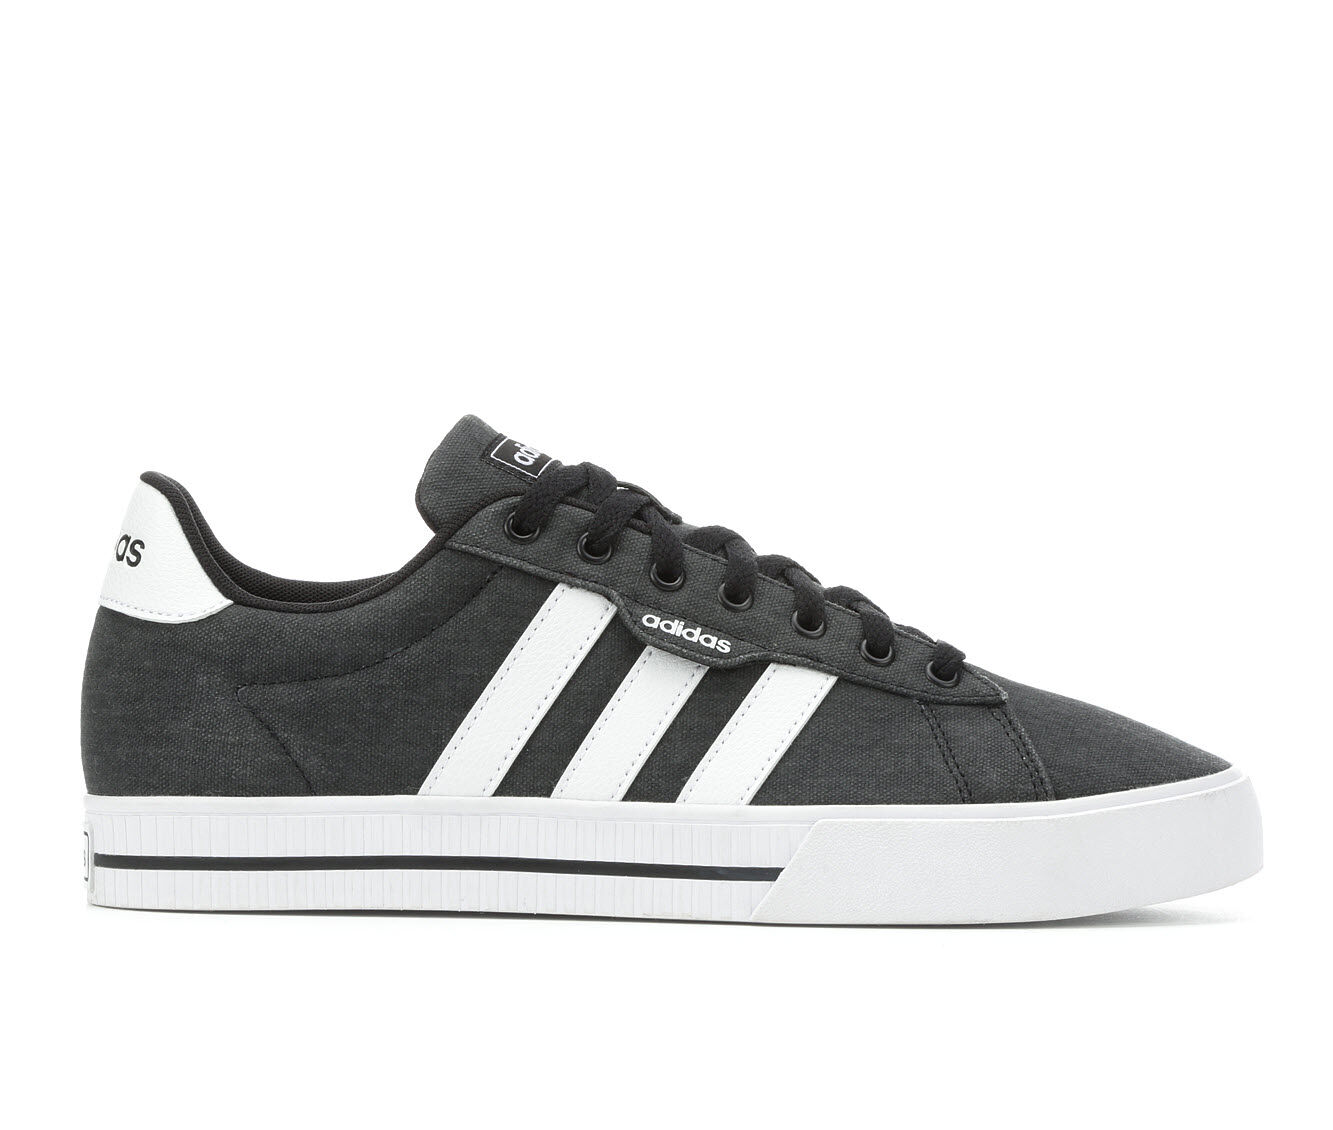 Men's Adidas Daily 3.0 Sneakers